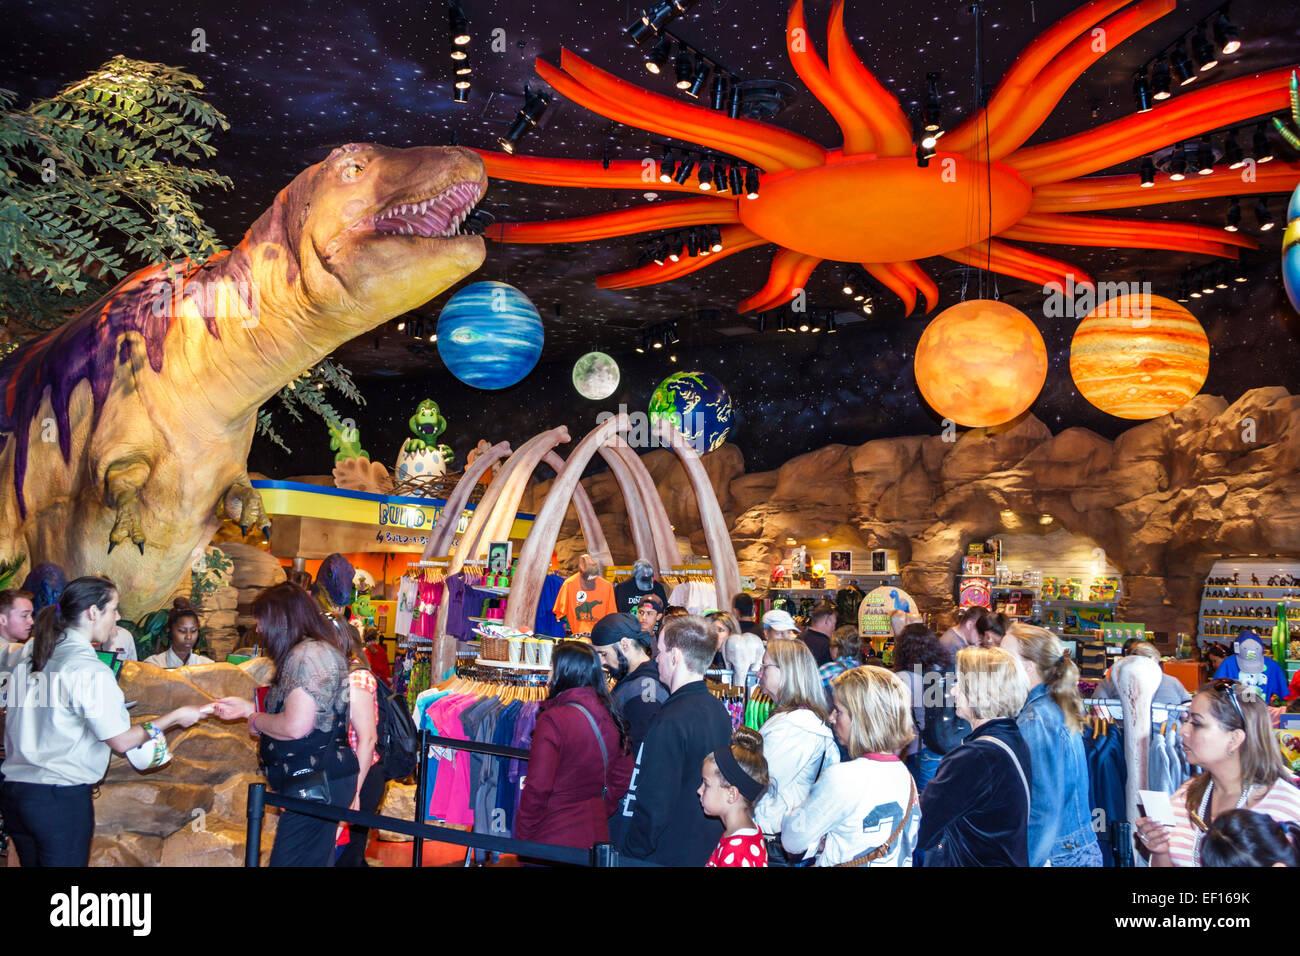 Floride Orlando Lake Buena Vista Downtown Disney shopping restauration divertissement T-Rex dinosaure restaurant Photo Stock